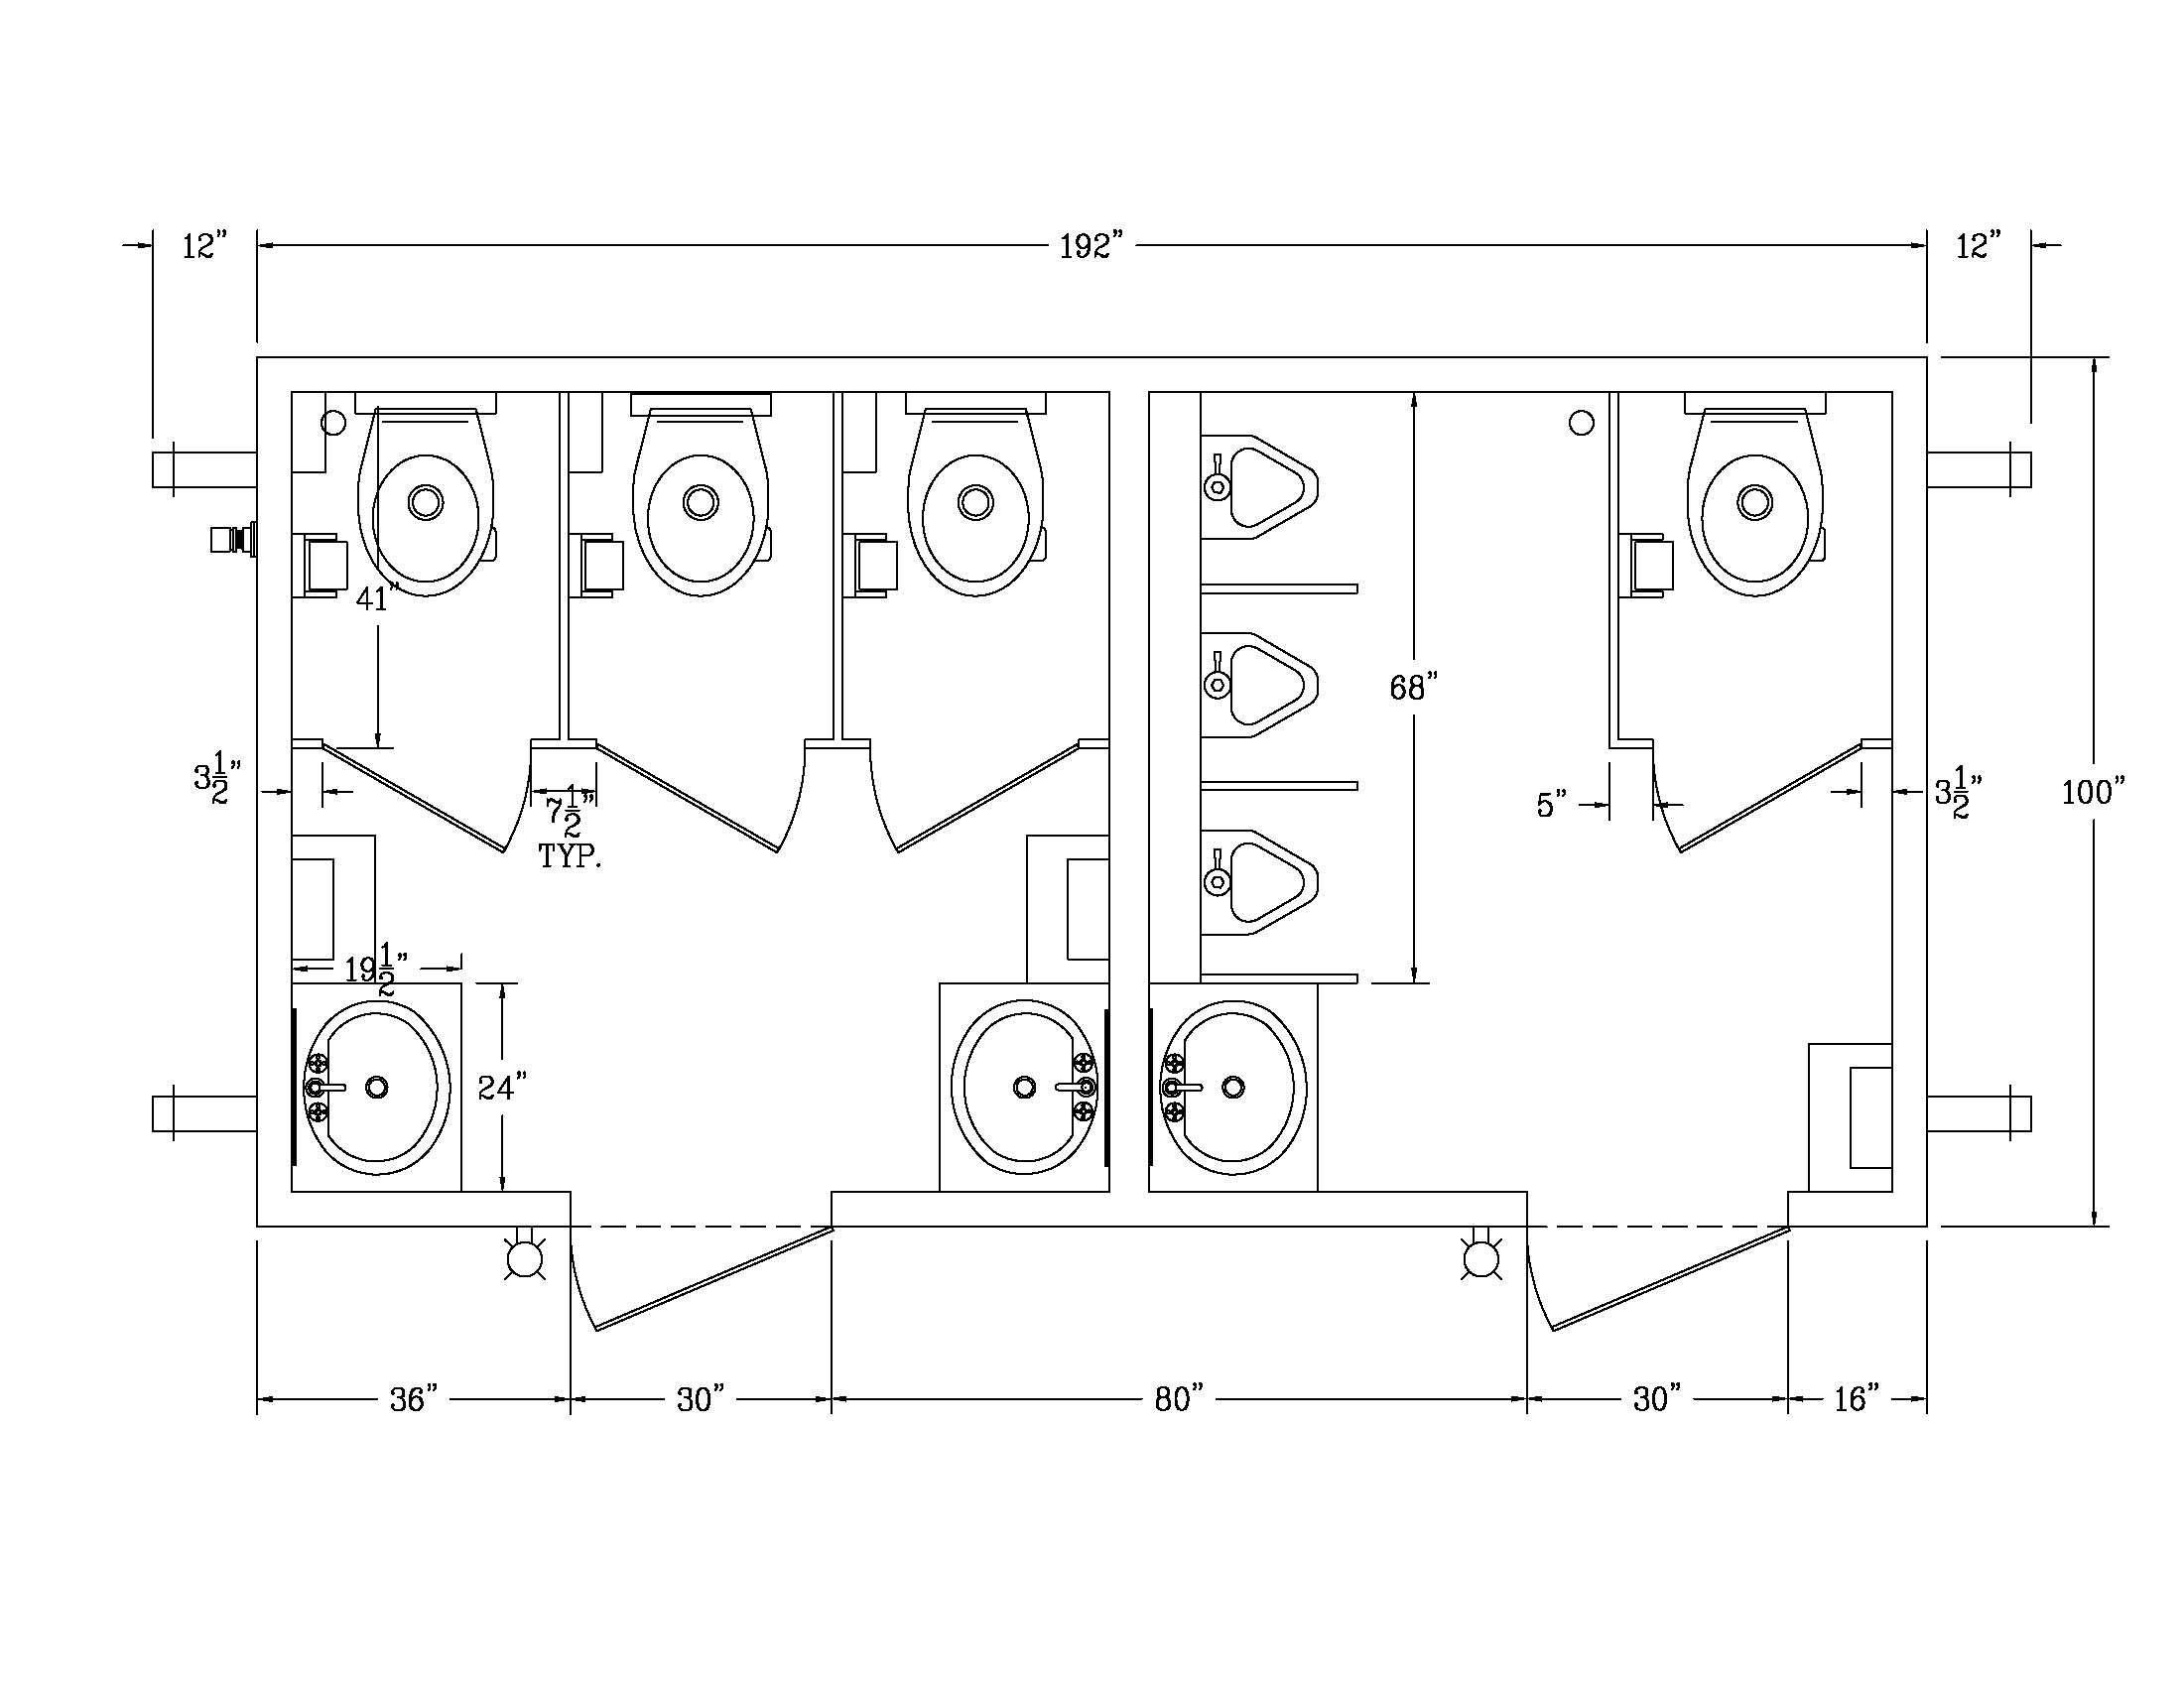 Commercial Washroom Layout Google Search Toilet Plan Bathroom